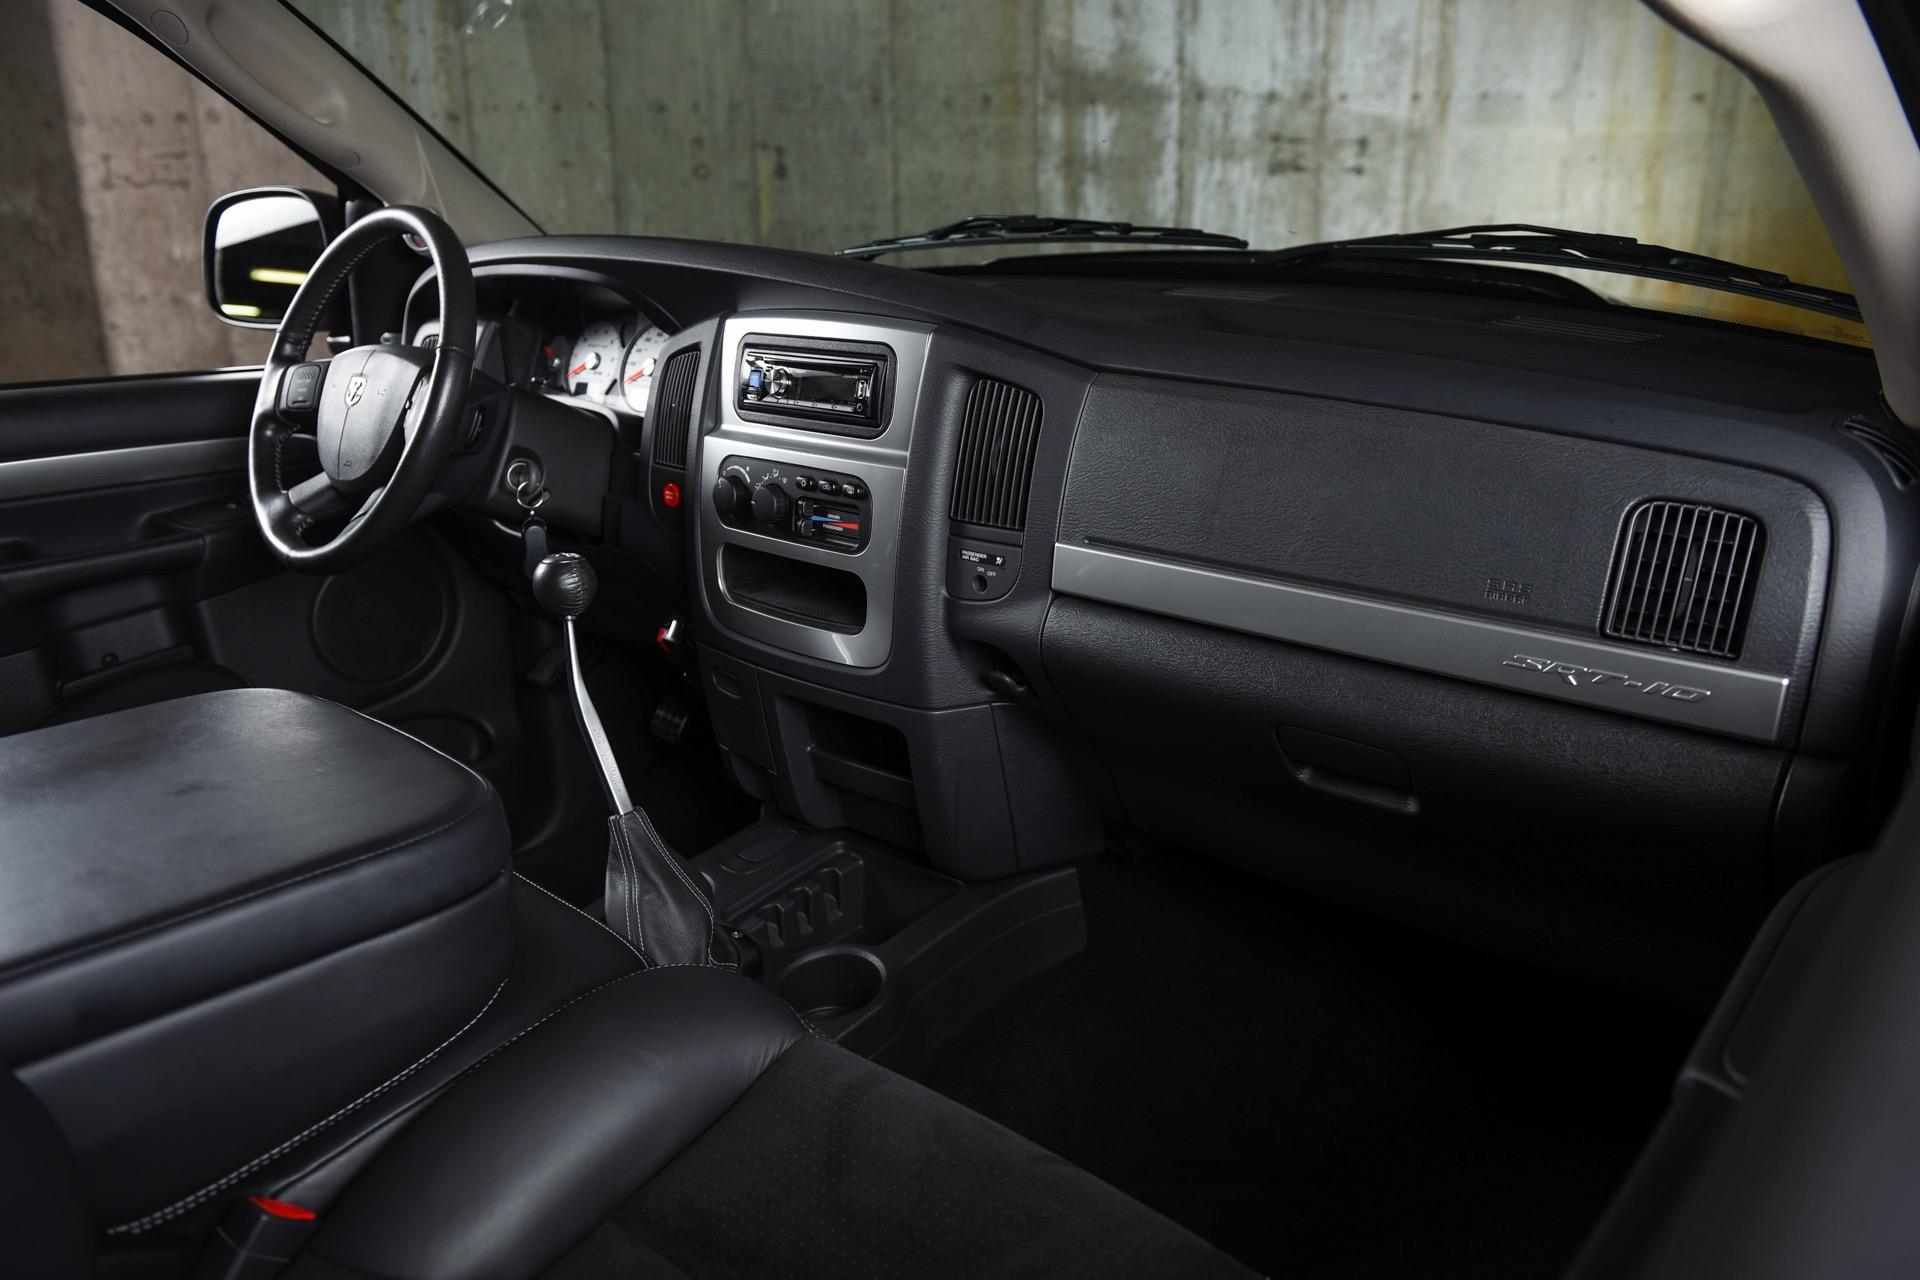 Used 2005 Dodge Ram Pickup 1500 SRT-10  | Valley Stream, NY